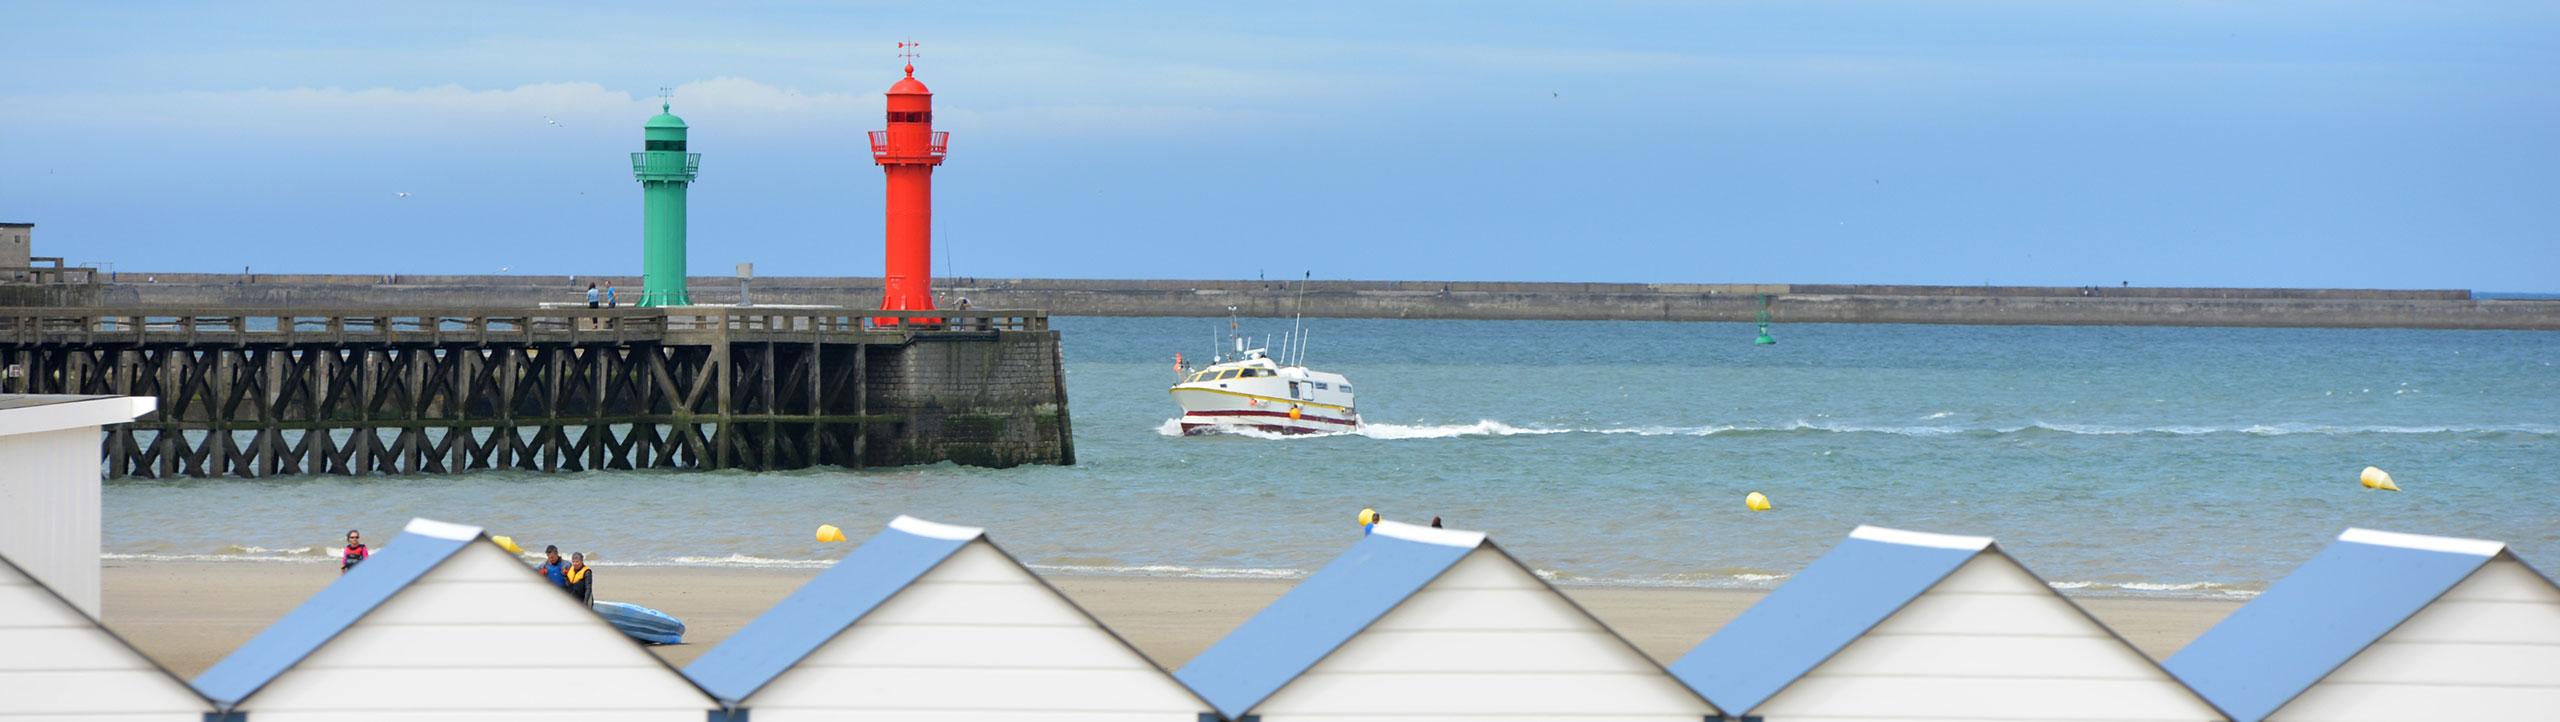 Votre agence immobili re boulogne sur mer for Piscine boulogne